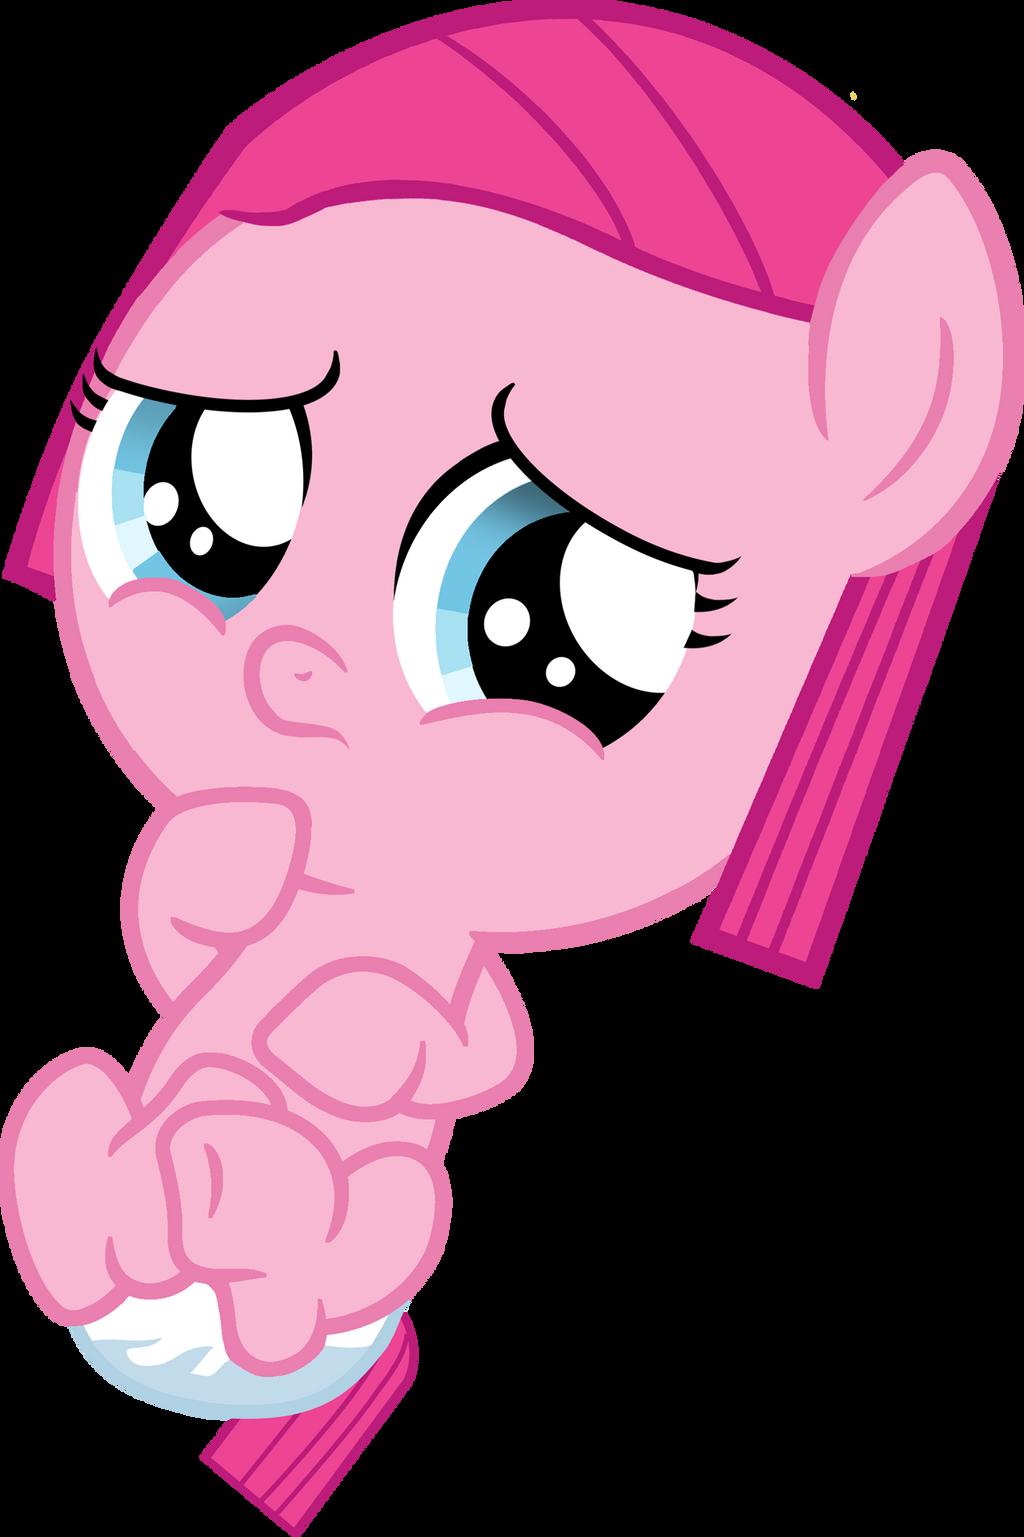 Cute, Baby Pinkie Pie by ShutterflyEQD on DeviantArt